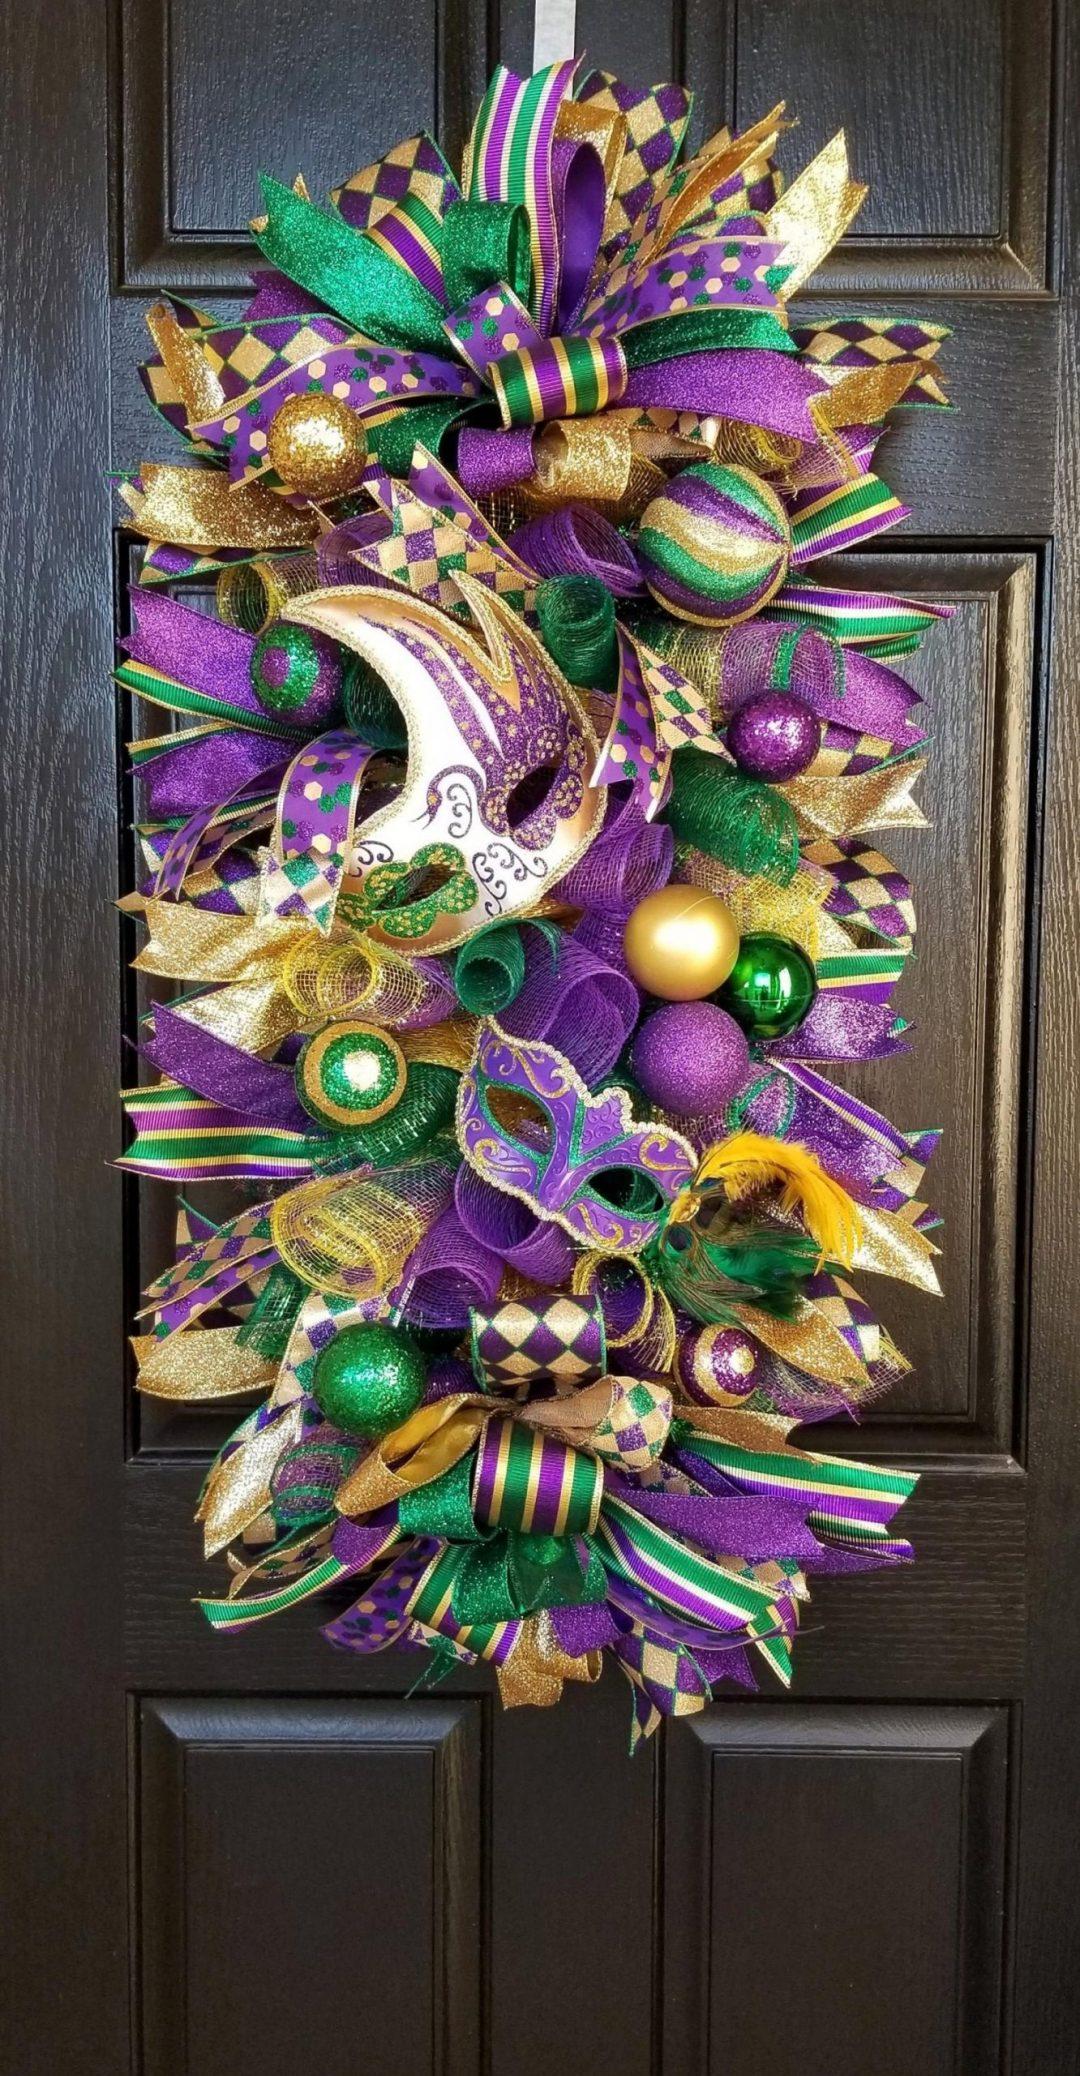 Deco mesh Mardi Gras wreaths with mask